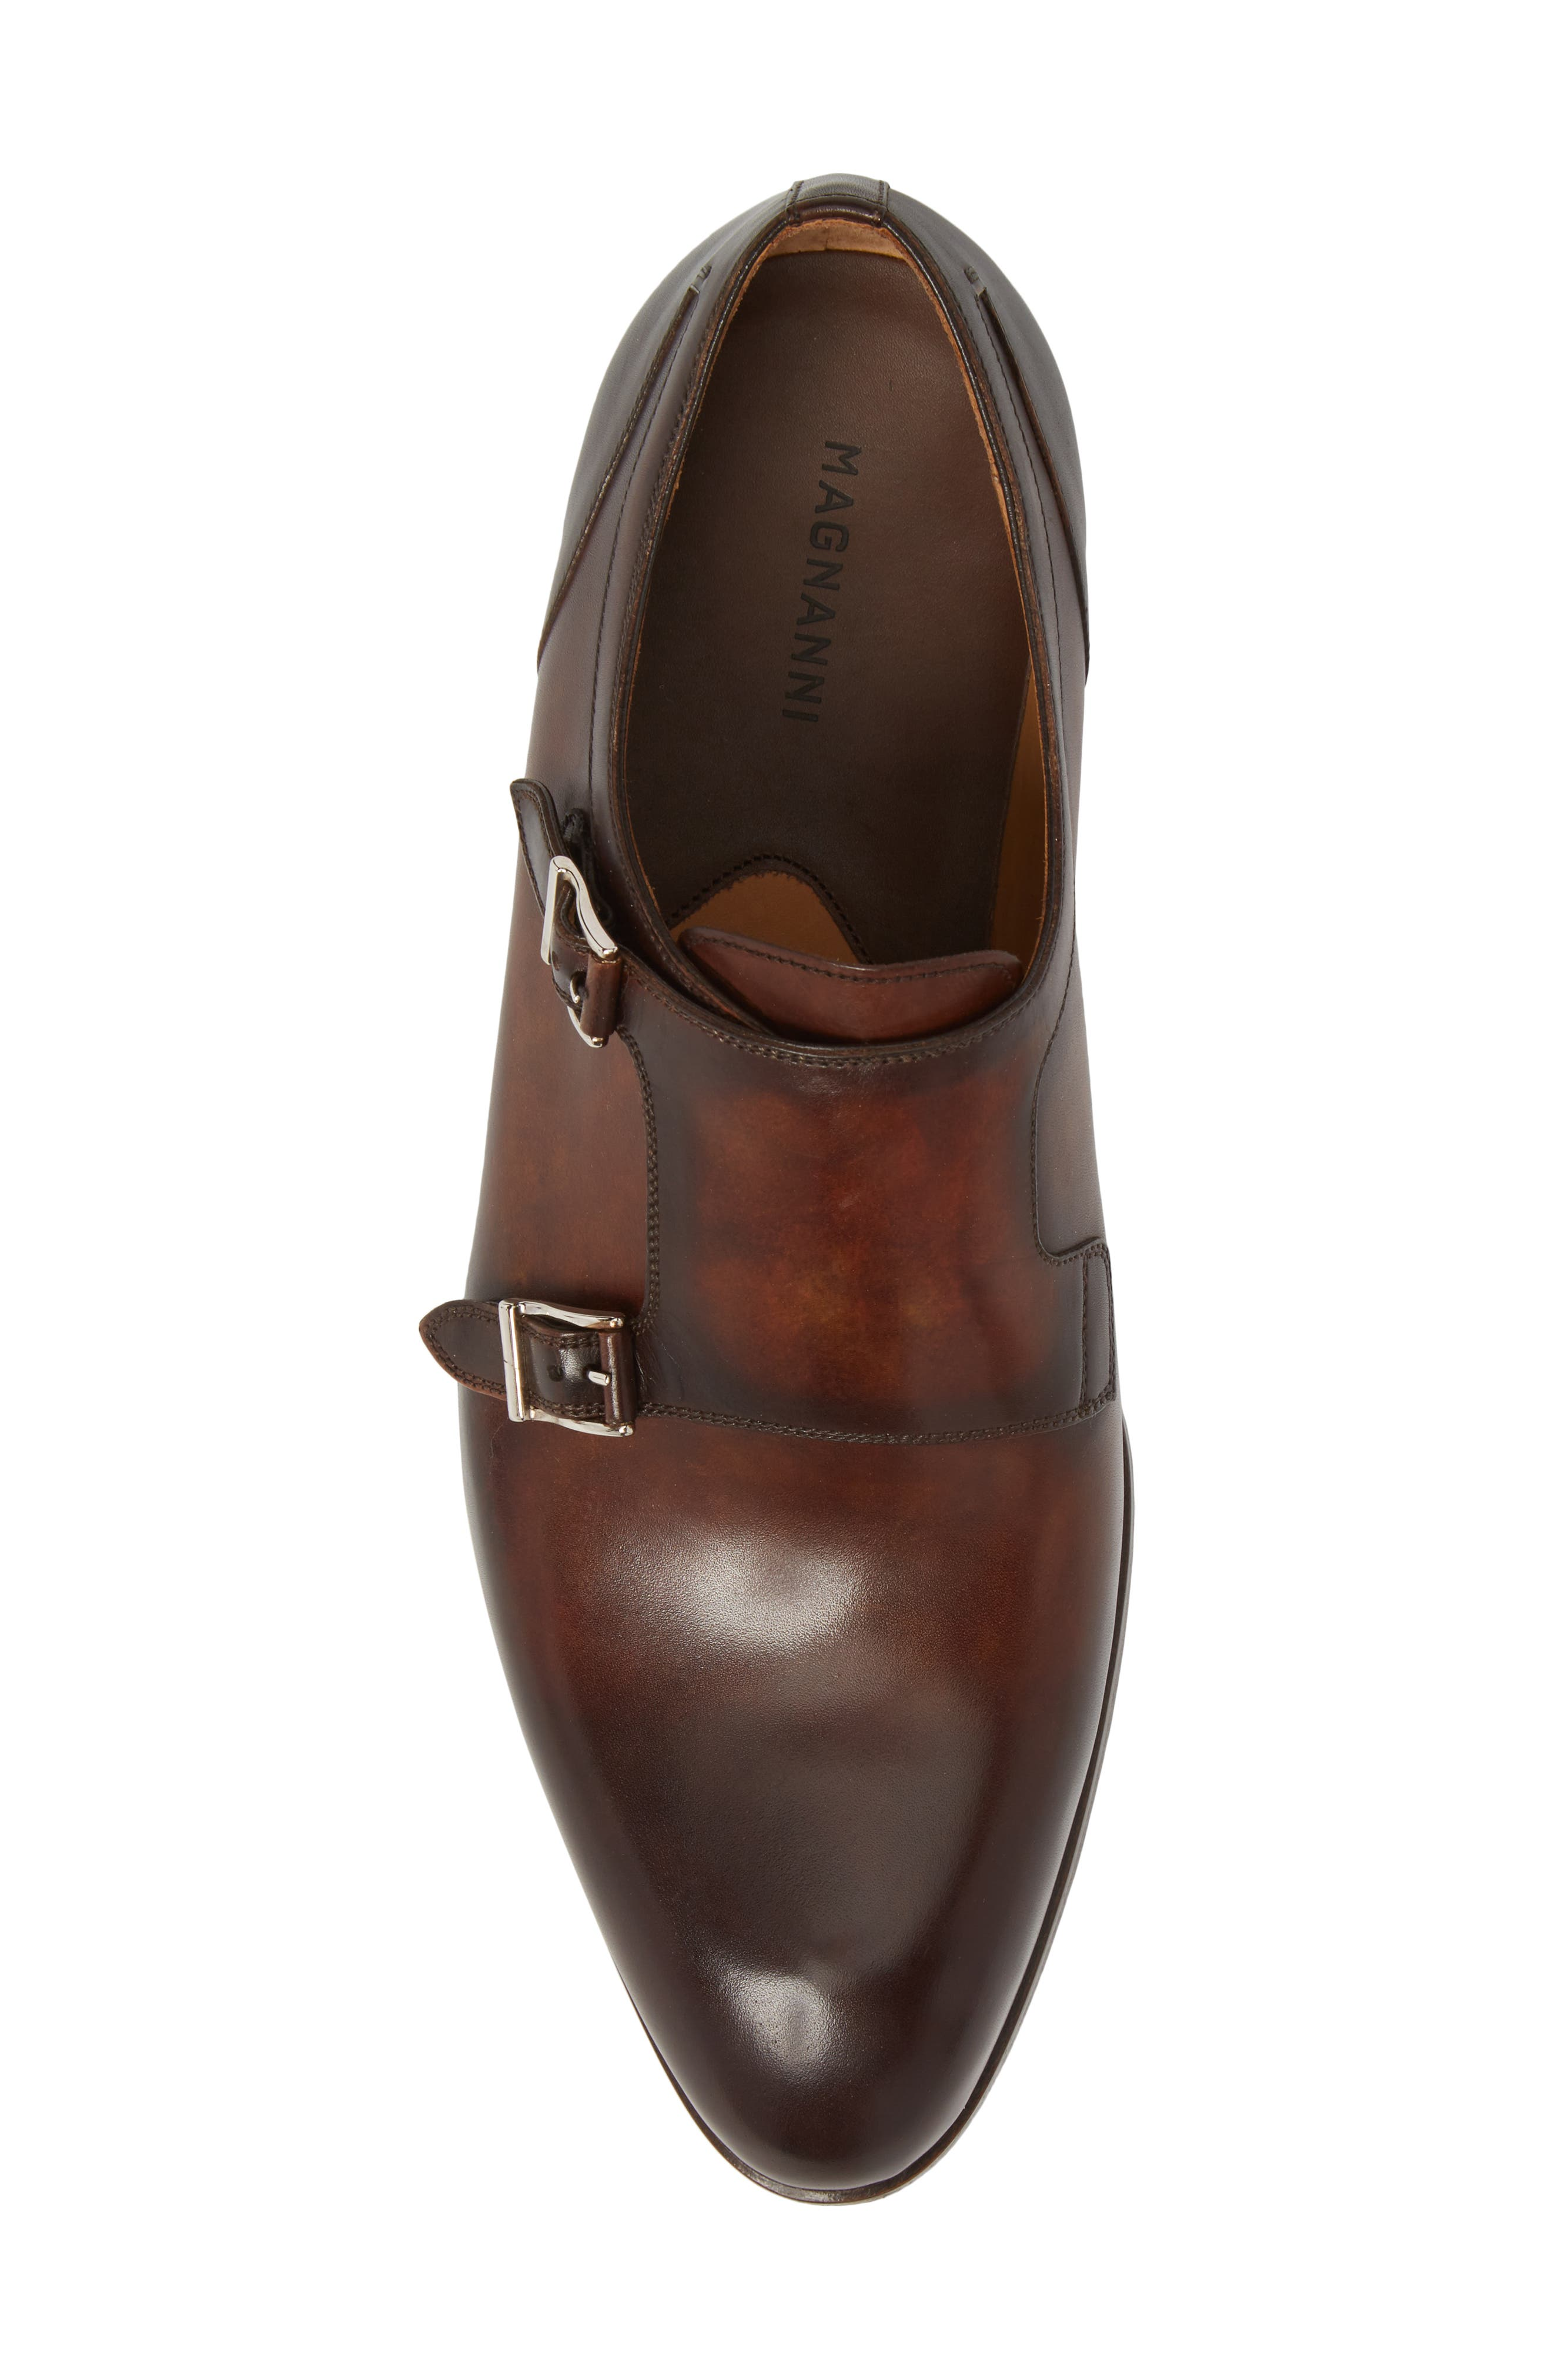 Pratt Double Strap Monk Shoe,                             Alternate thumbnail 5, color,                             Tabaco Leather